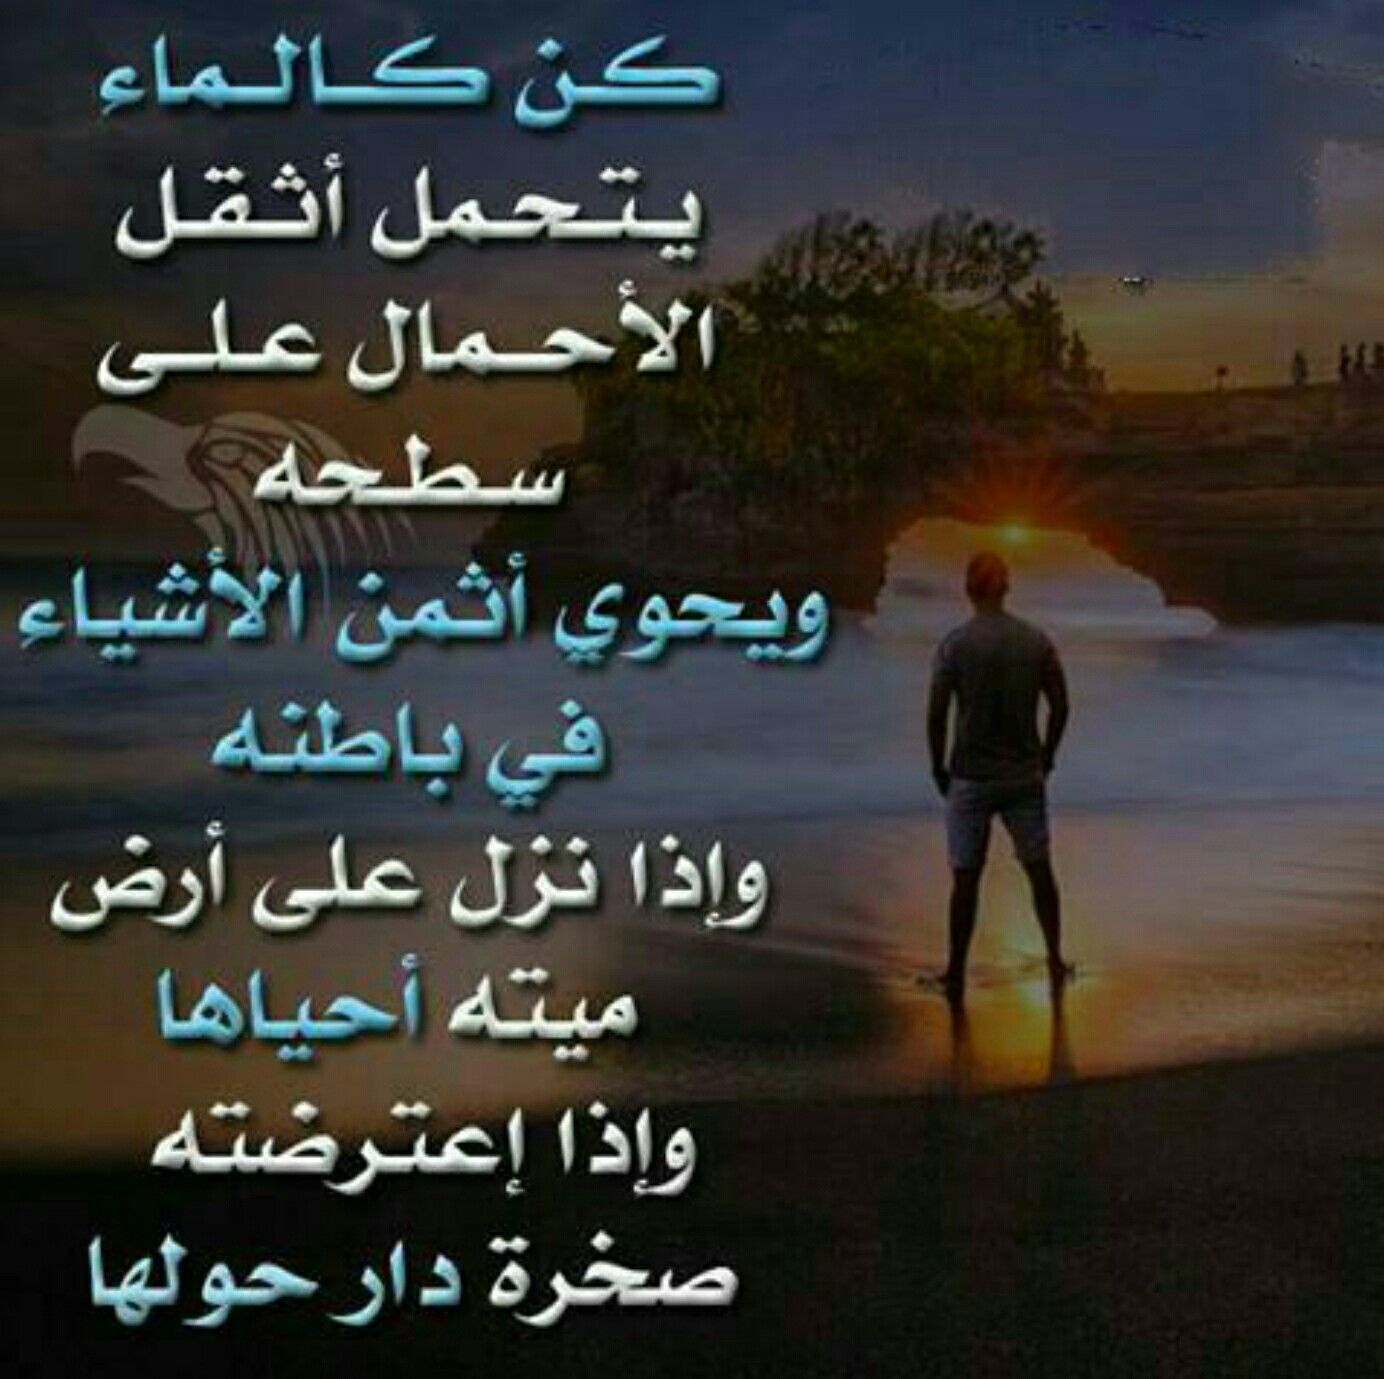 كن كالماء Islamic Wallpaper Movie Posters Quotes